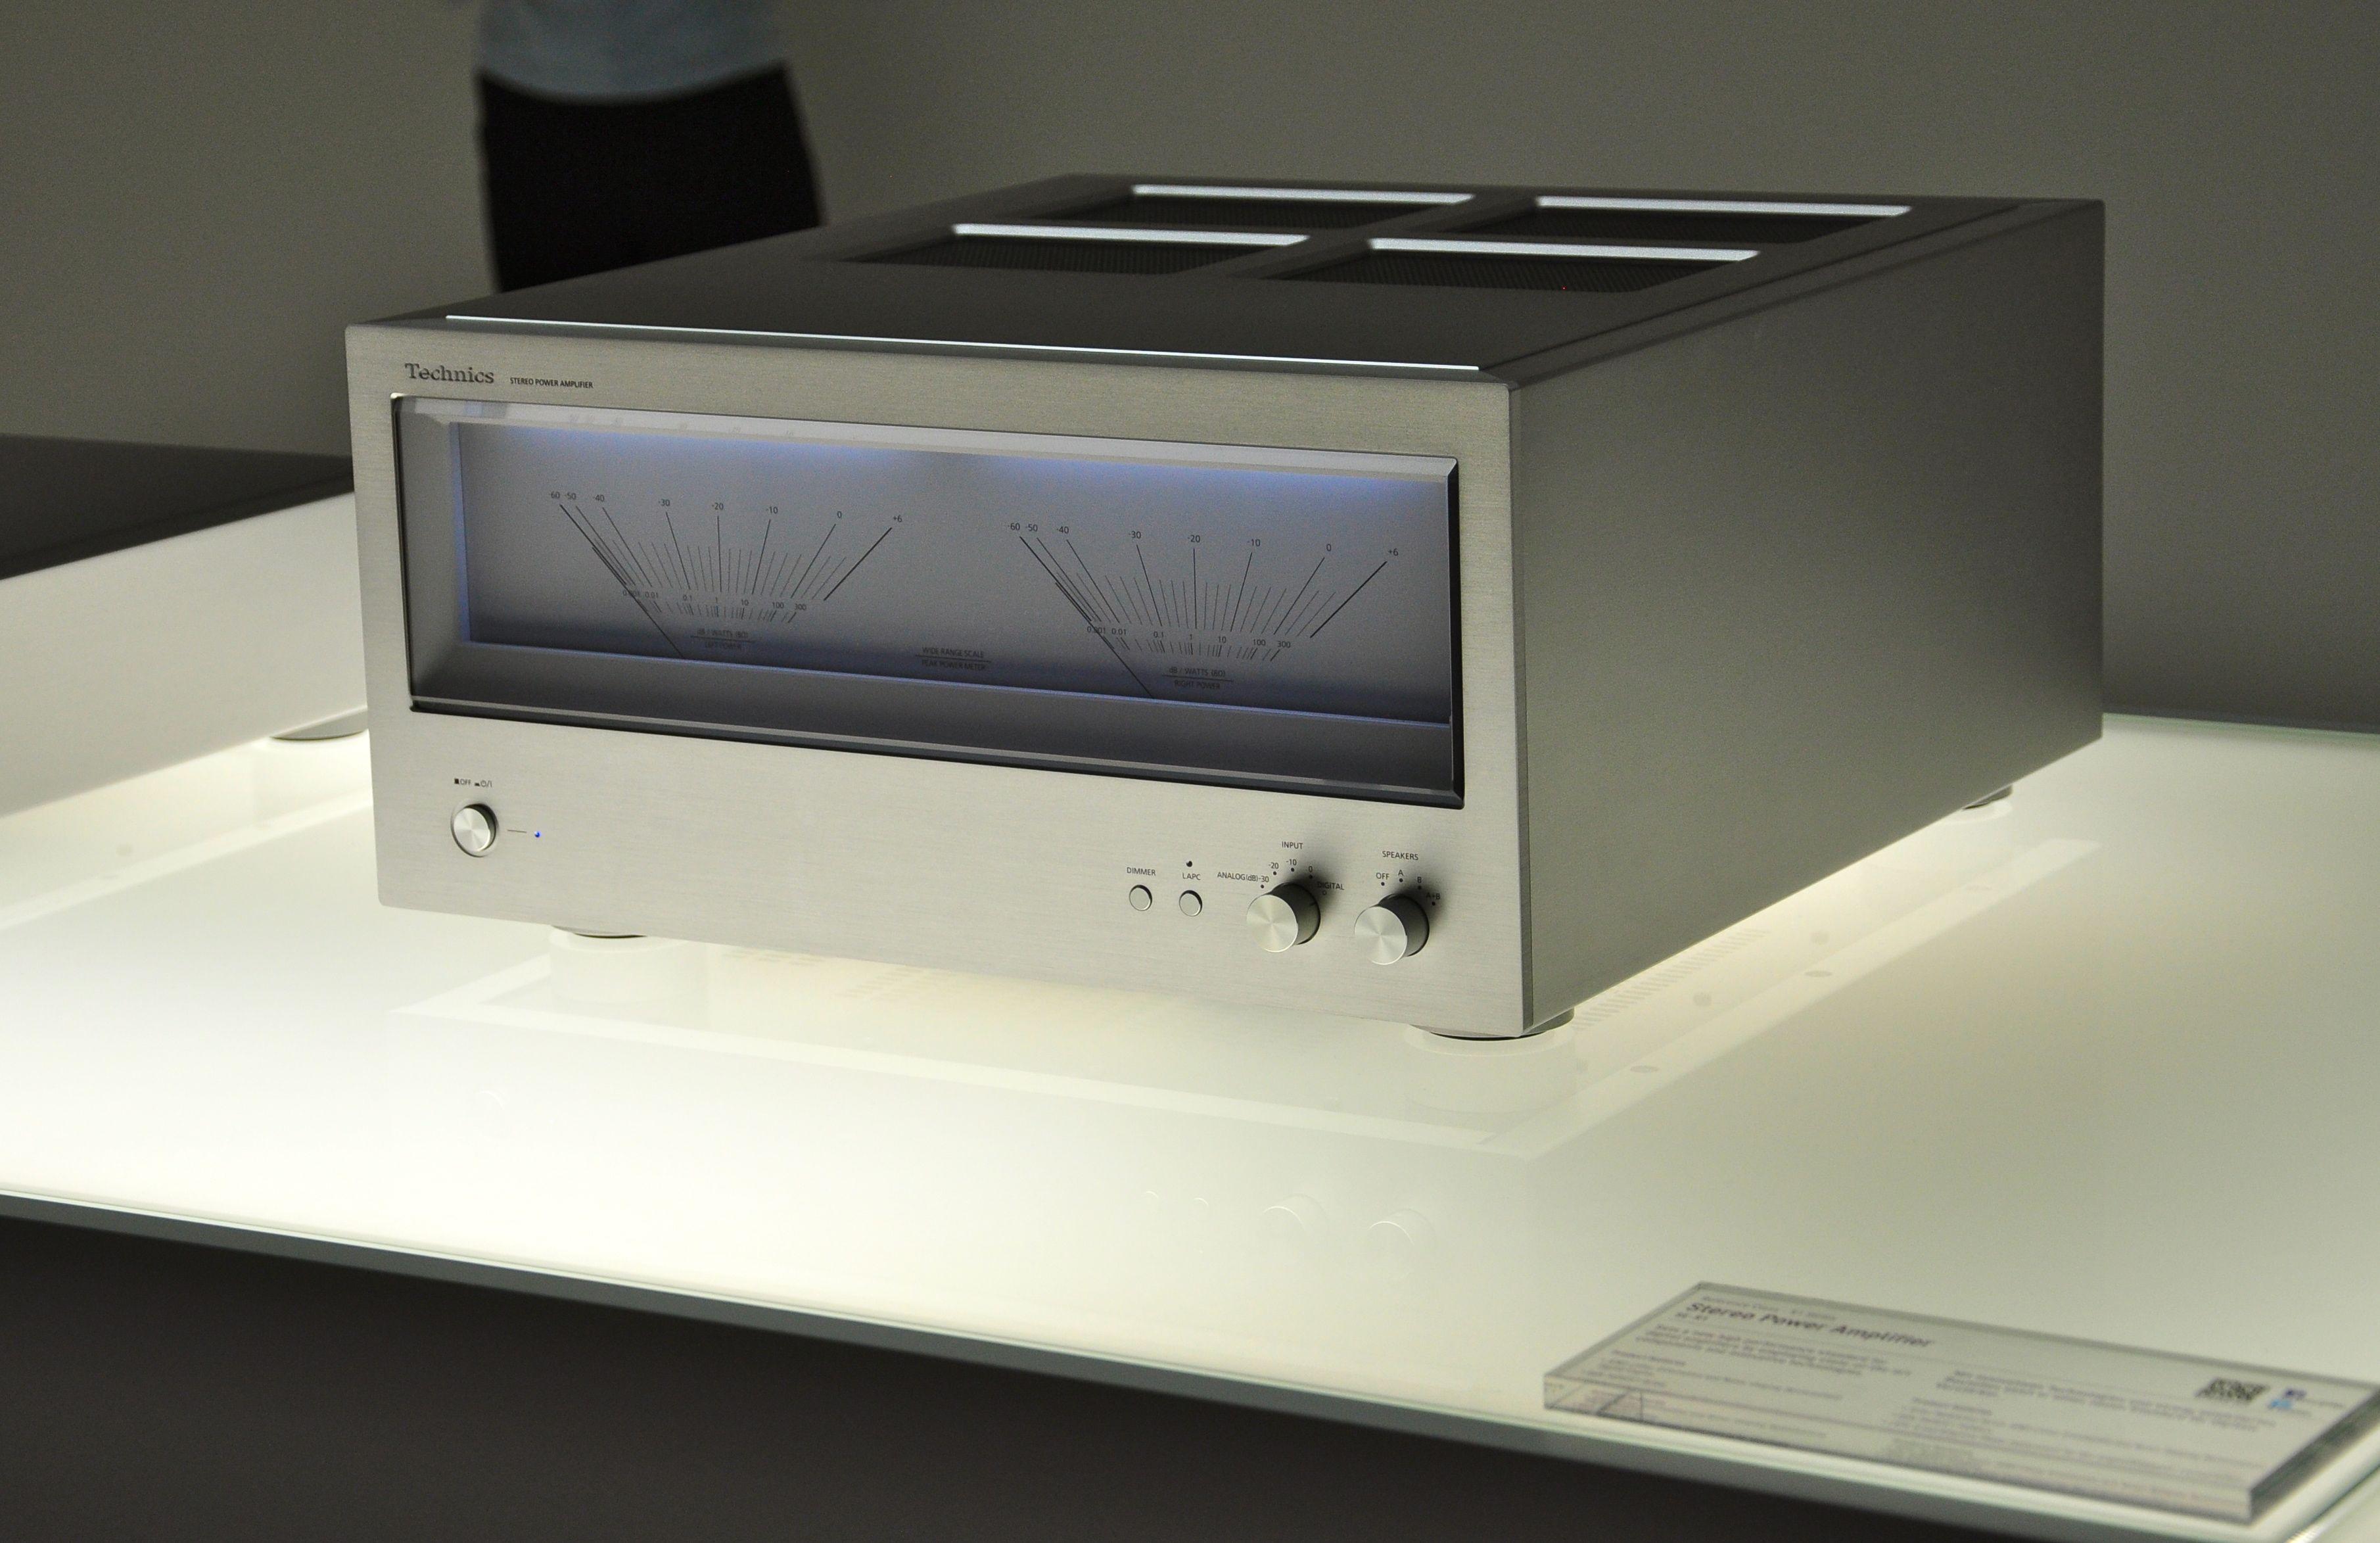 technics panasonic. Black Bedroom Furniture Sets. Home Design Ideas